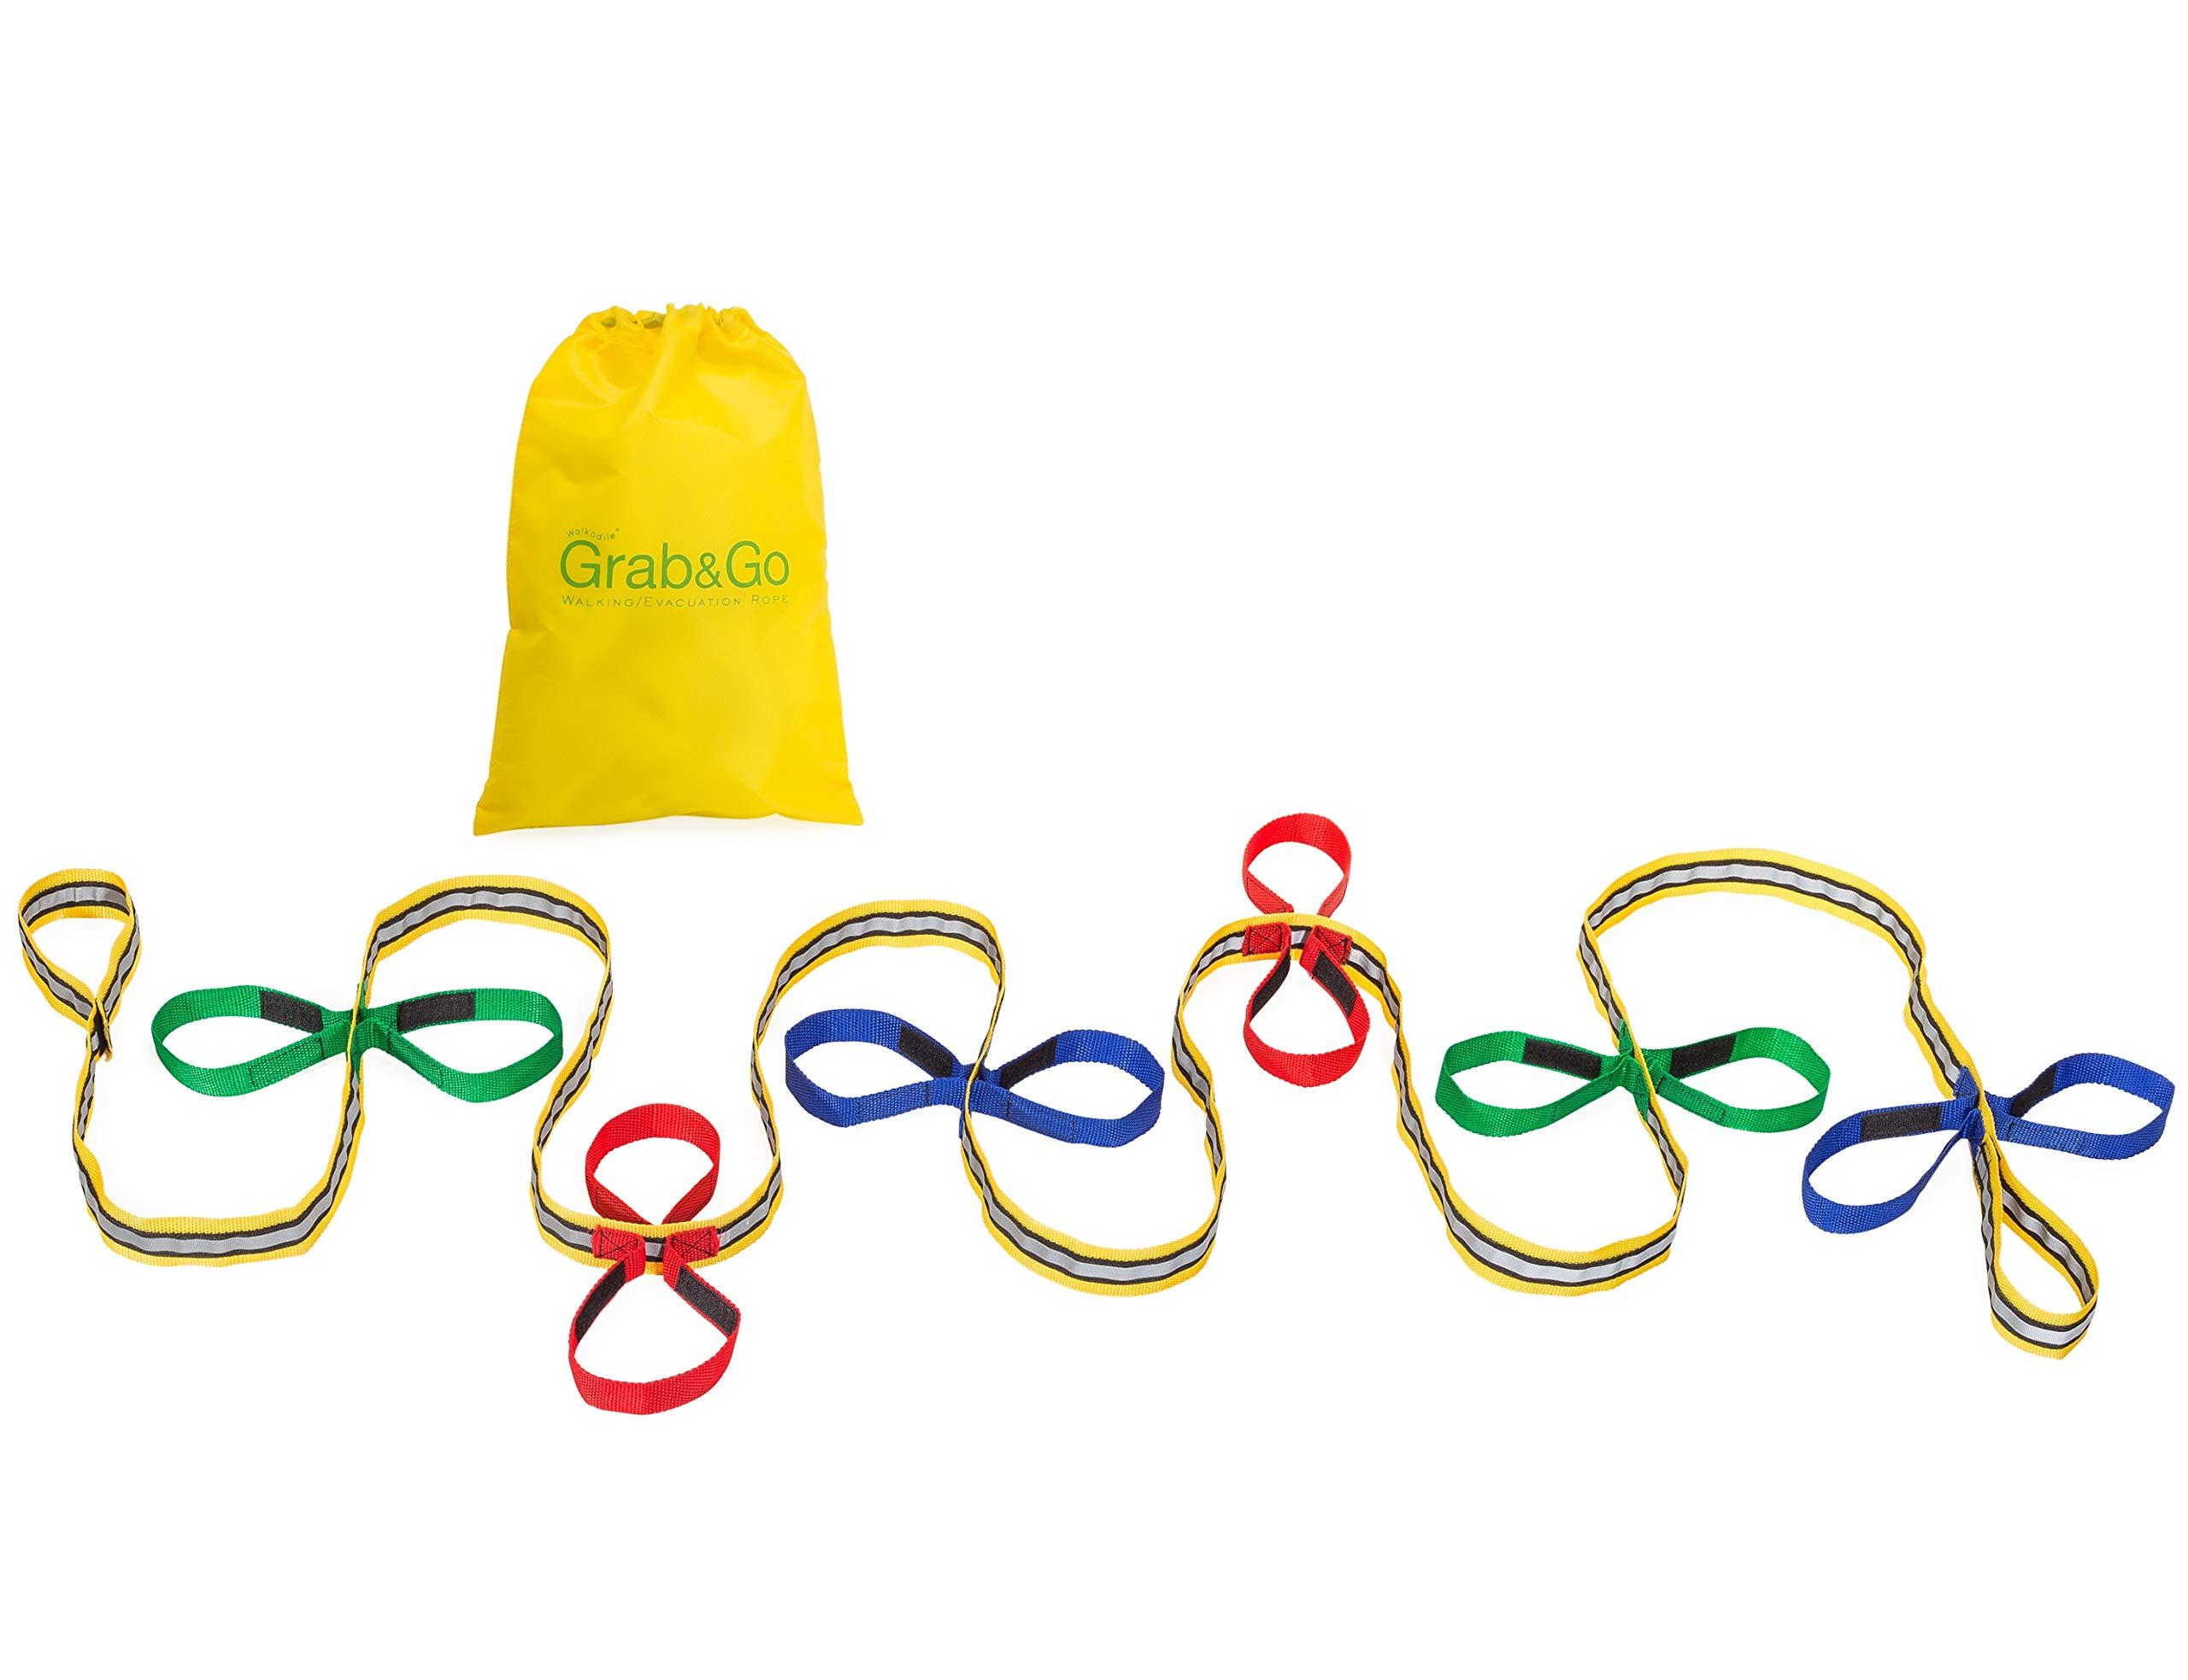 Grab & Go Children's Walking Rope (12 Child) with Safe Hi-Viz Details - Teacher Approved Safety Walk Ropes for Toddlers & Preschool Kids. Includes Free Learning Games for Walks Guide.